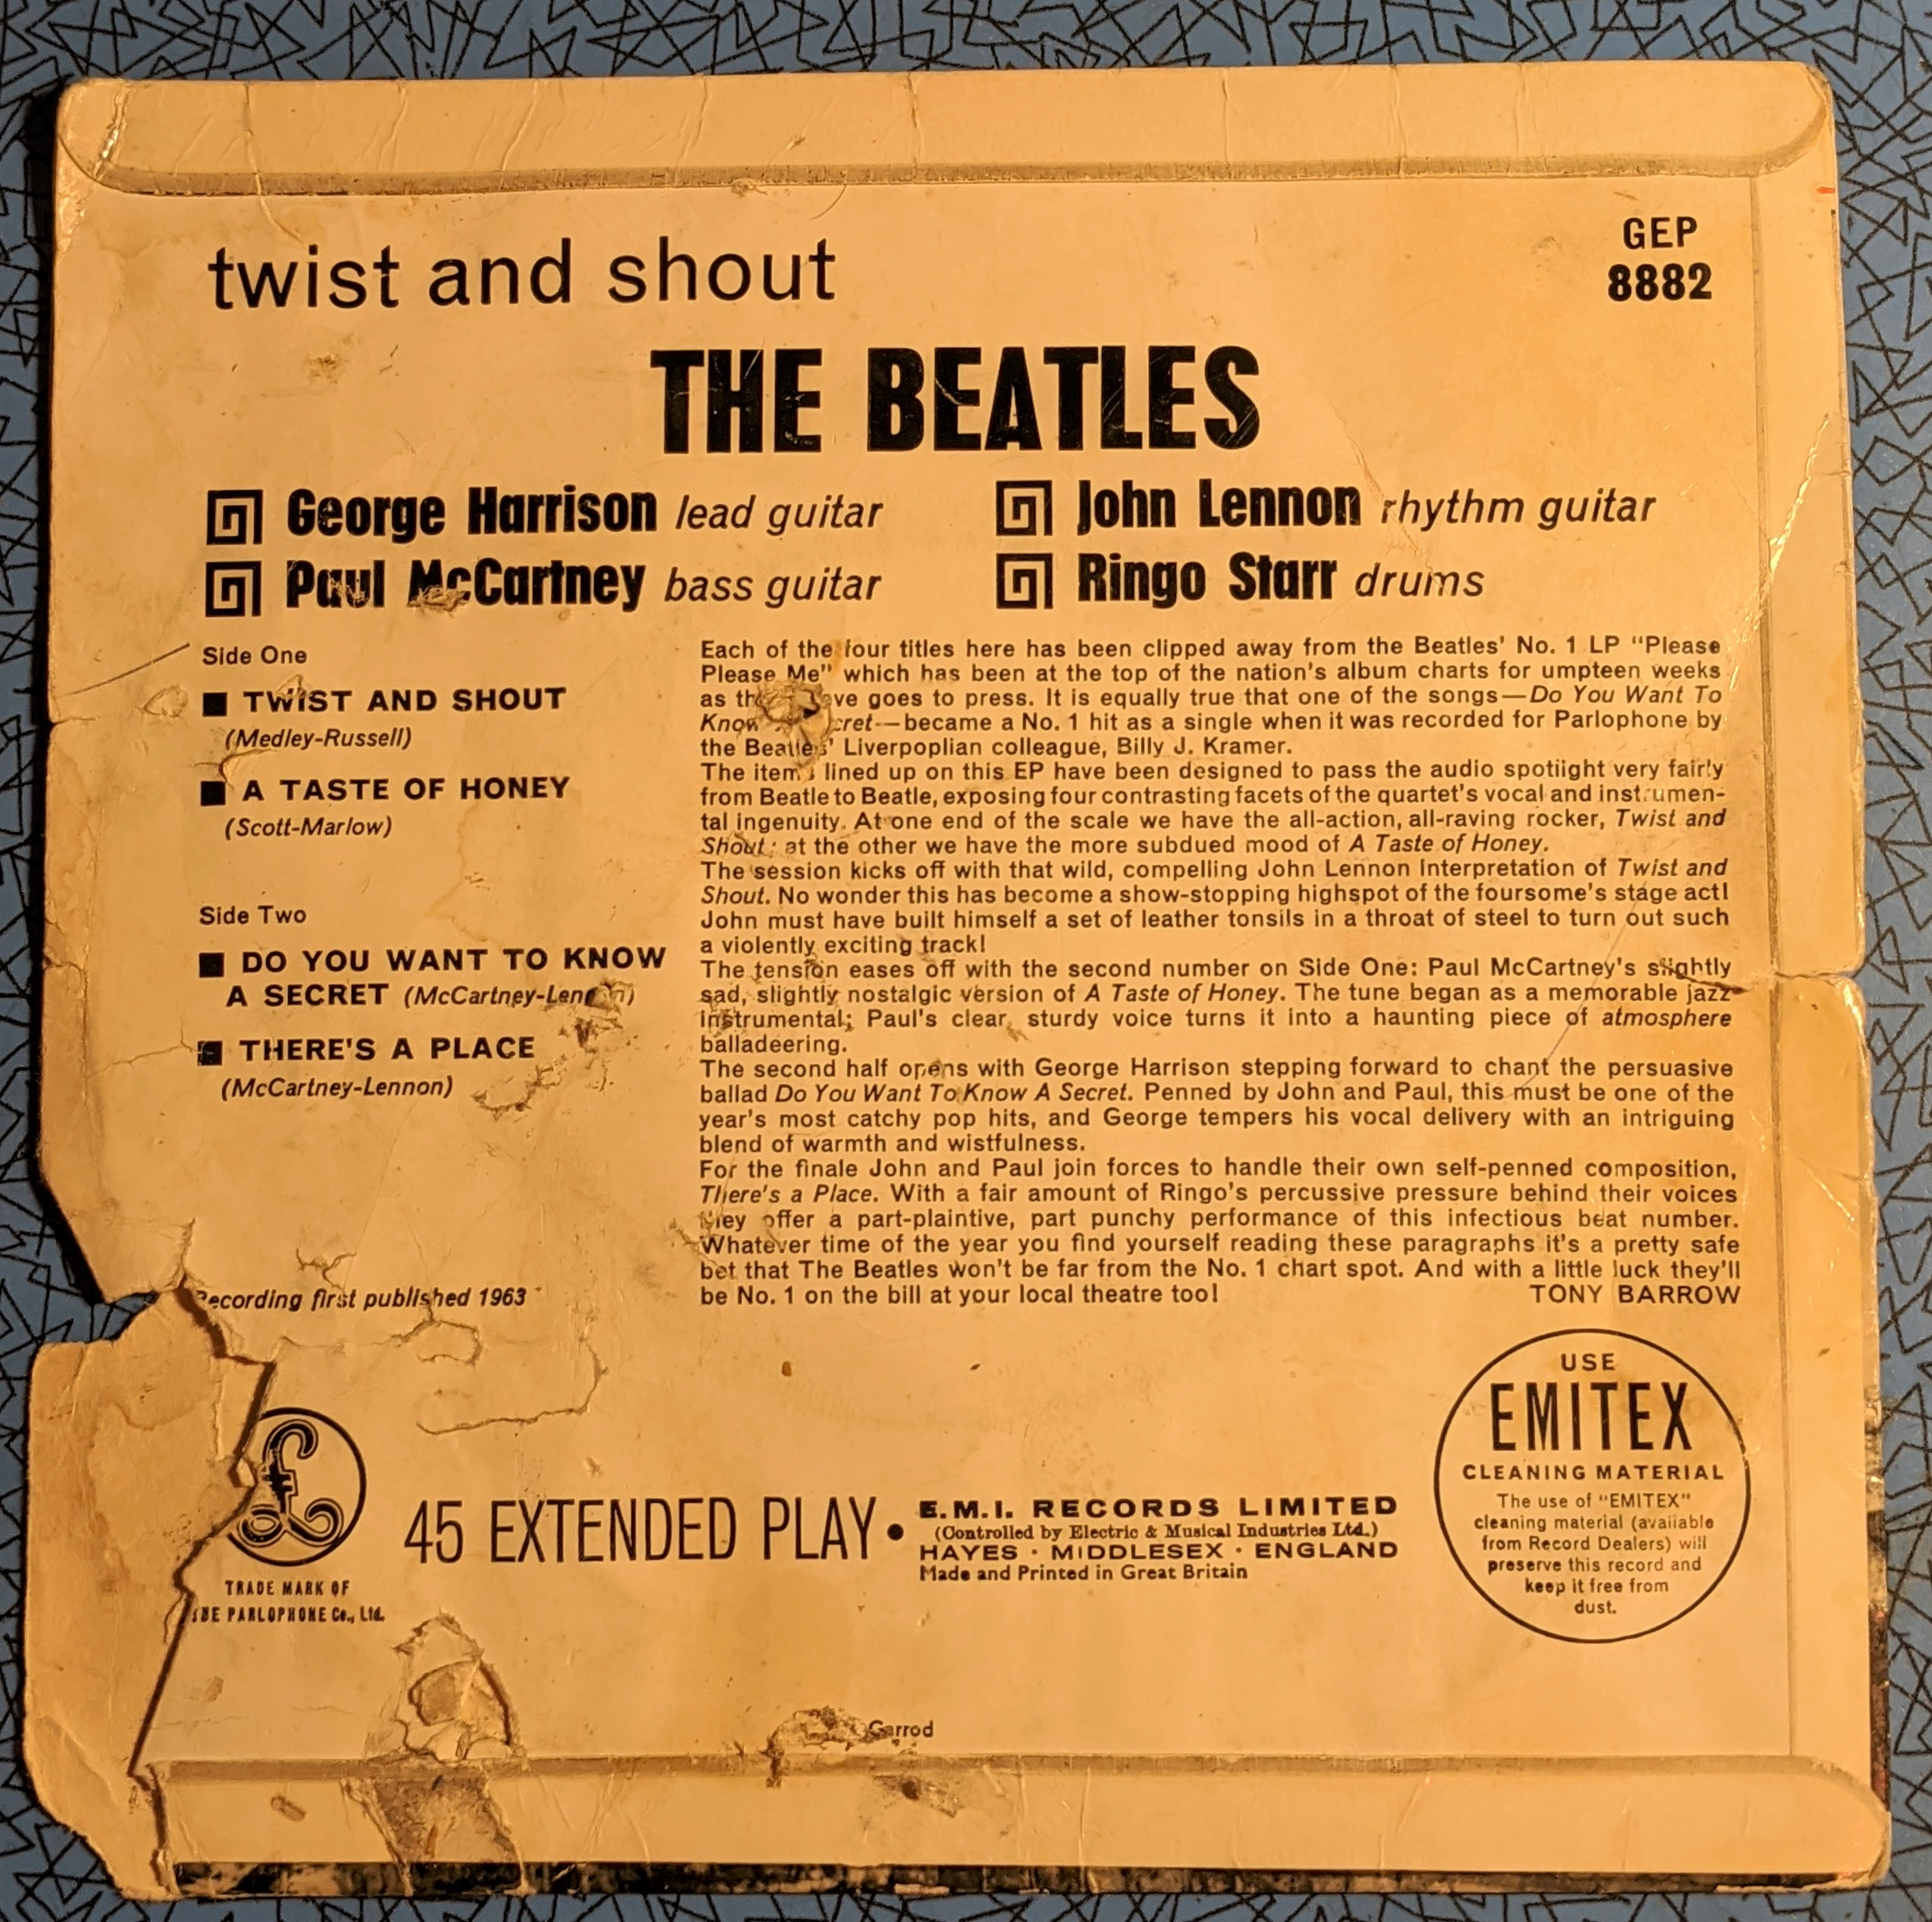 Beatles EP